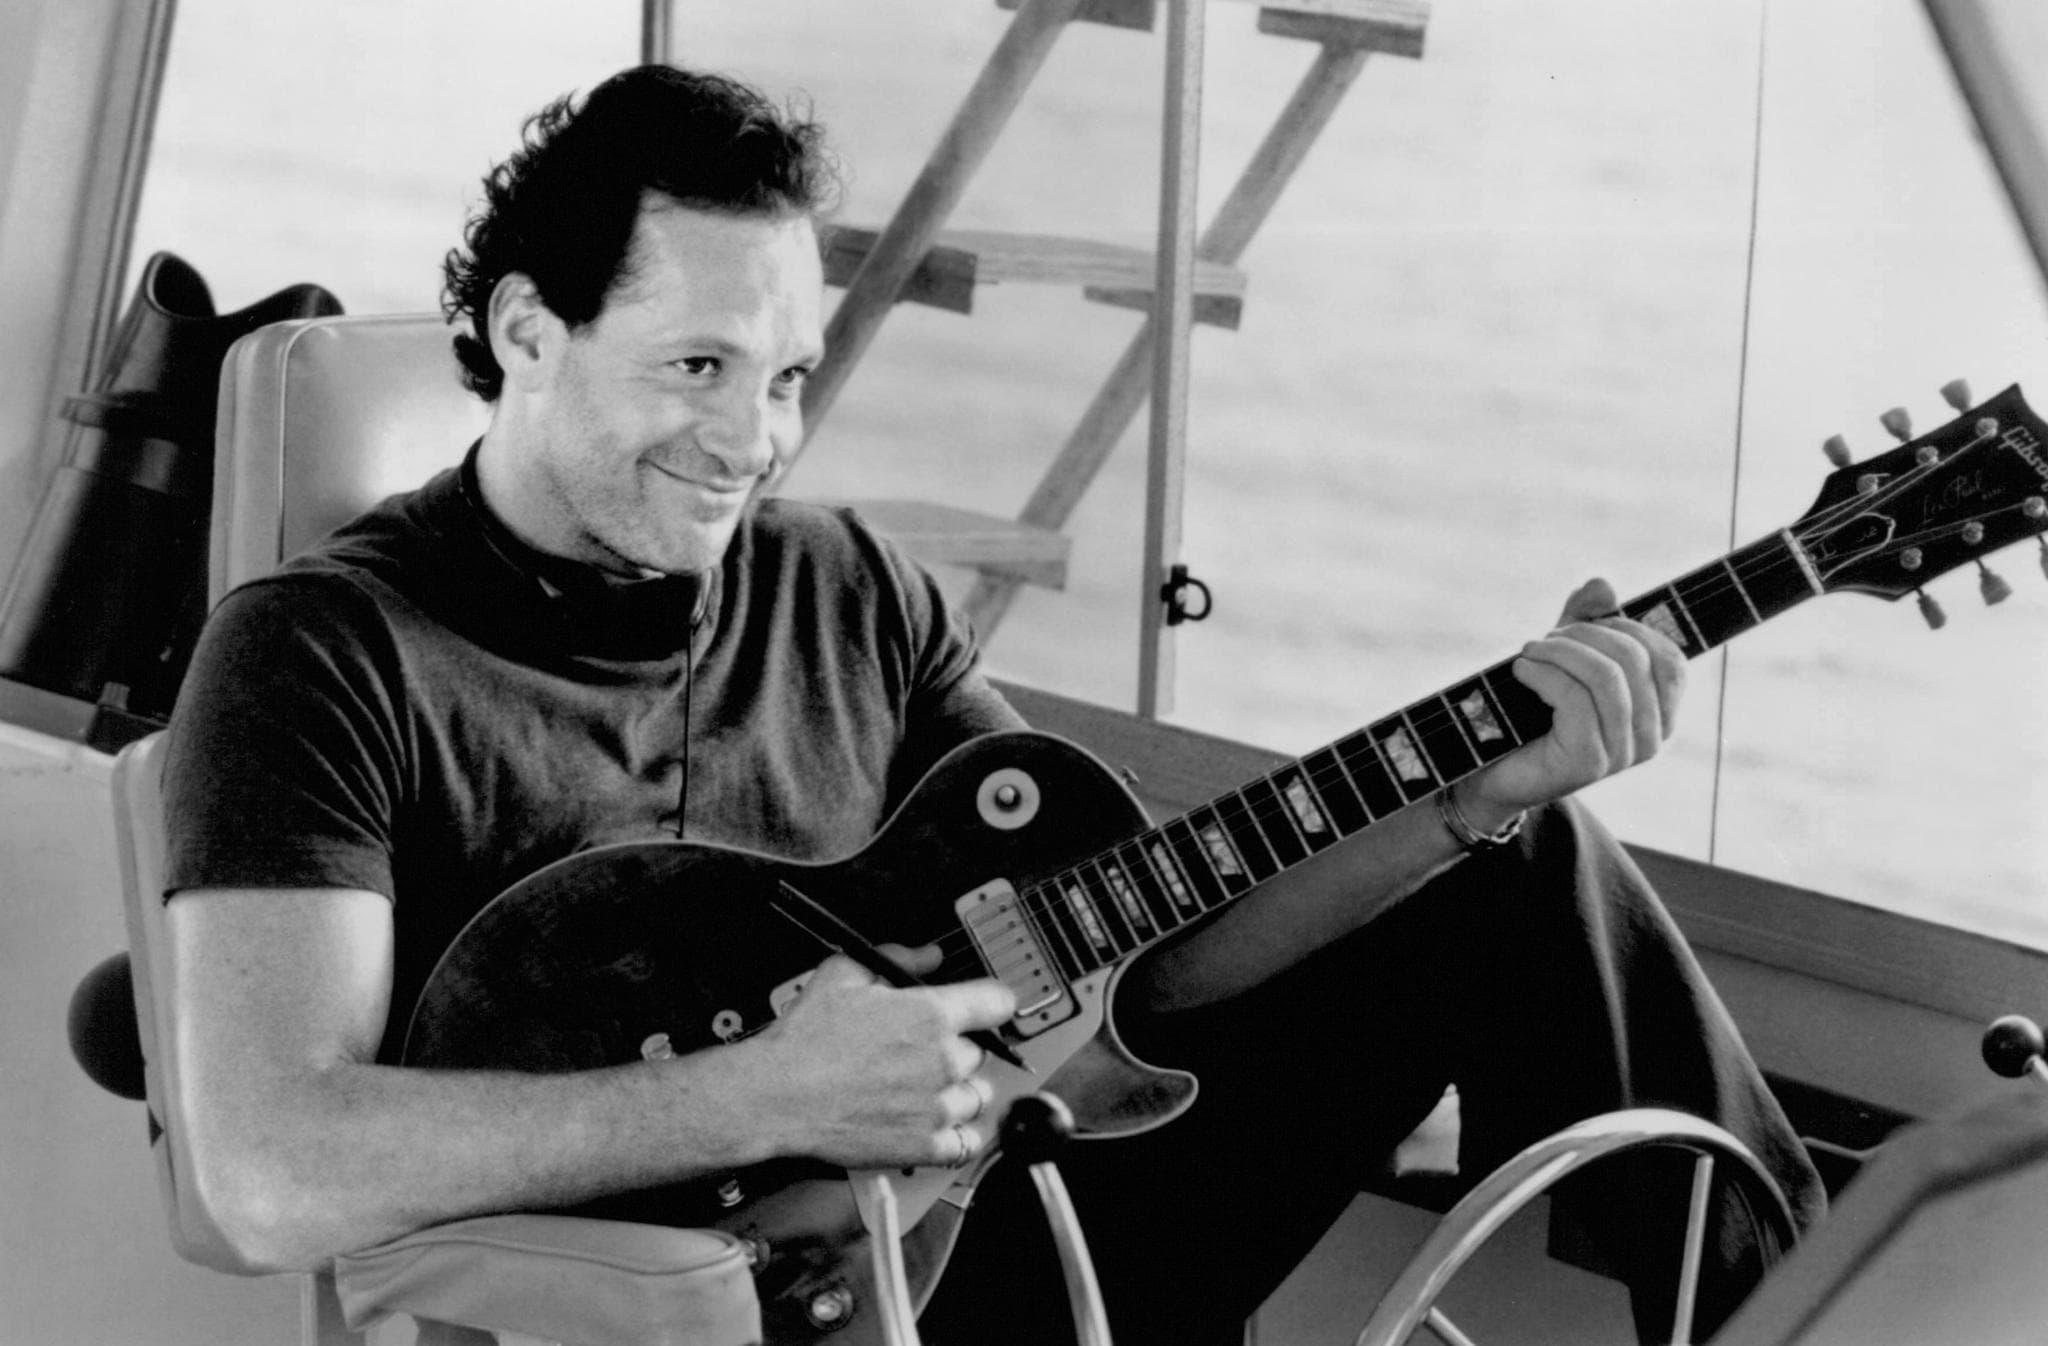 Steve Guttenberg Background